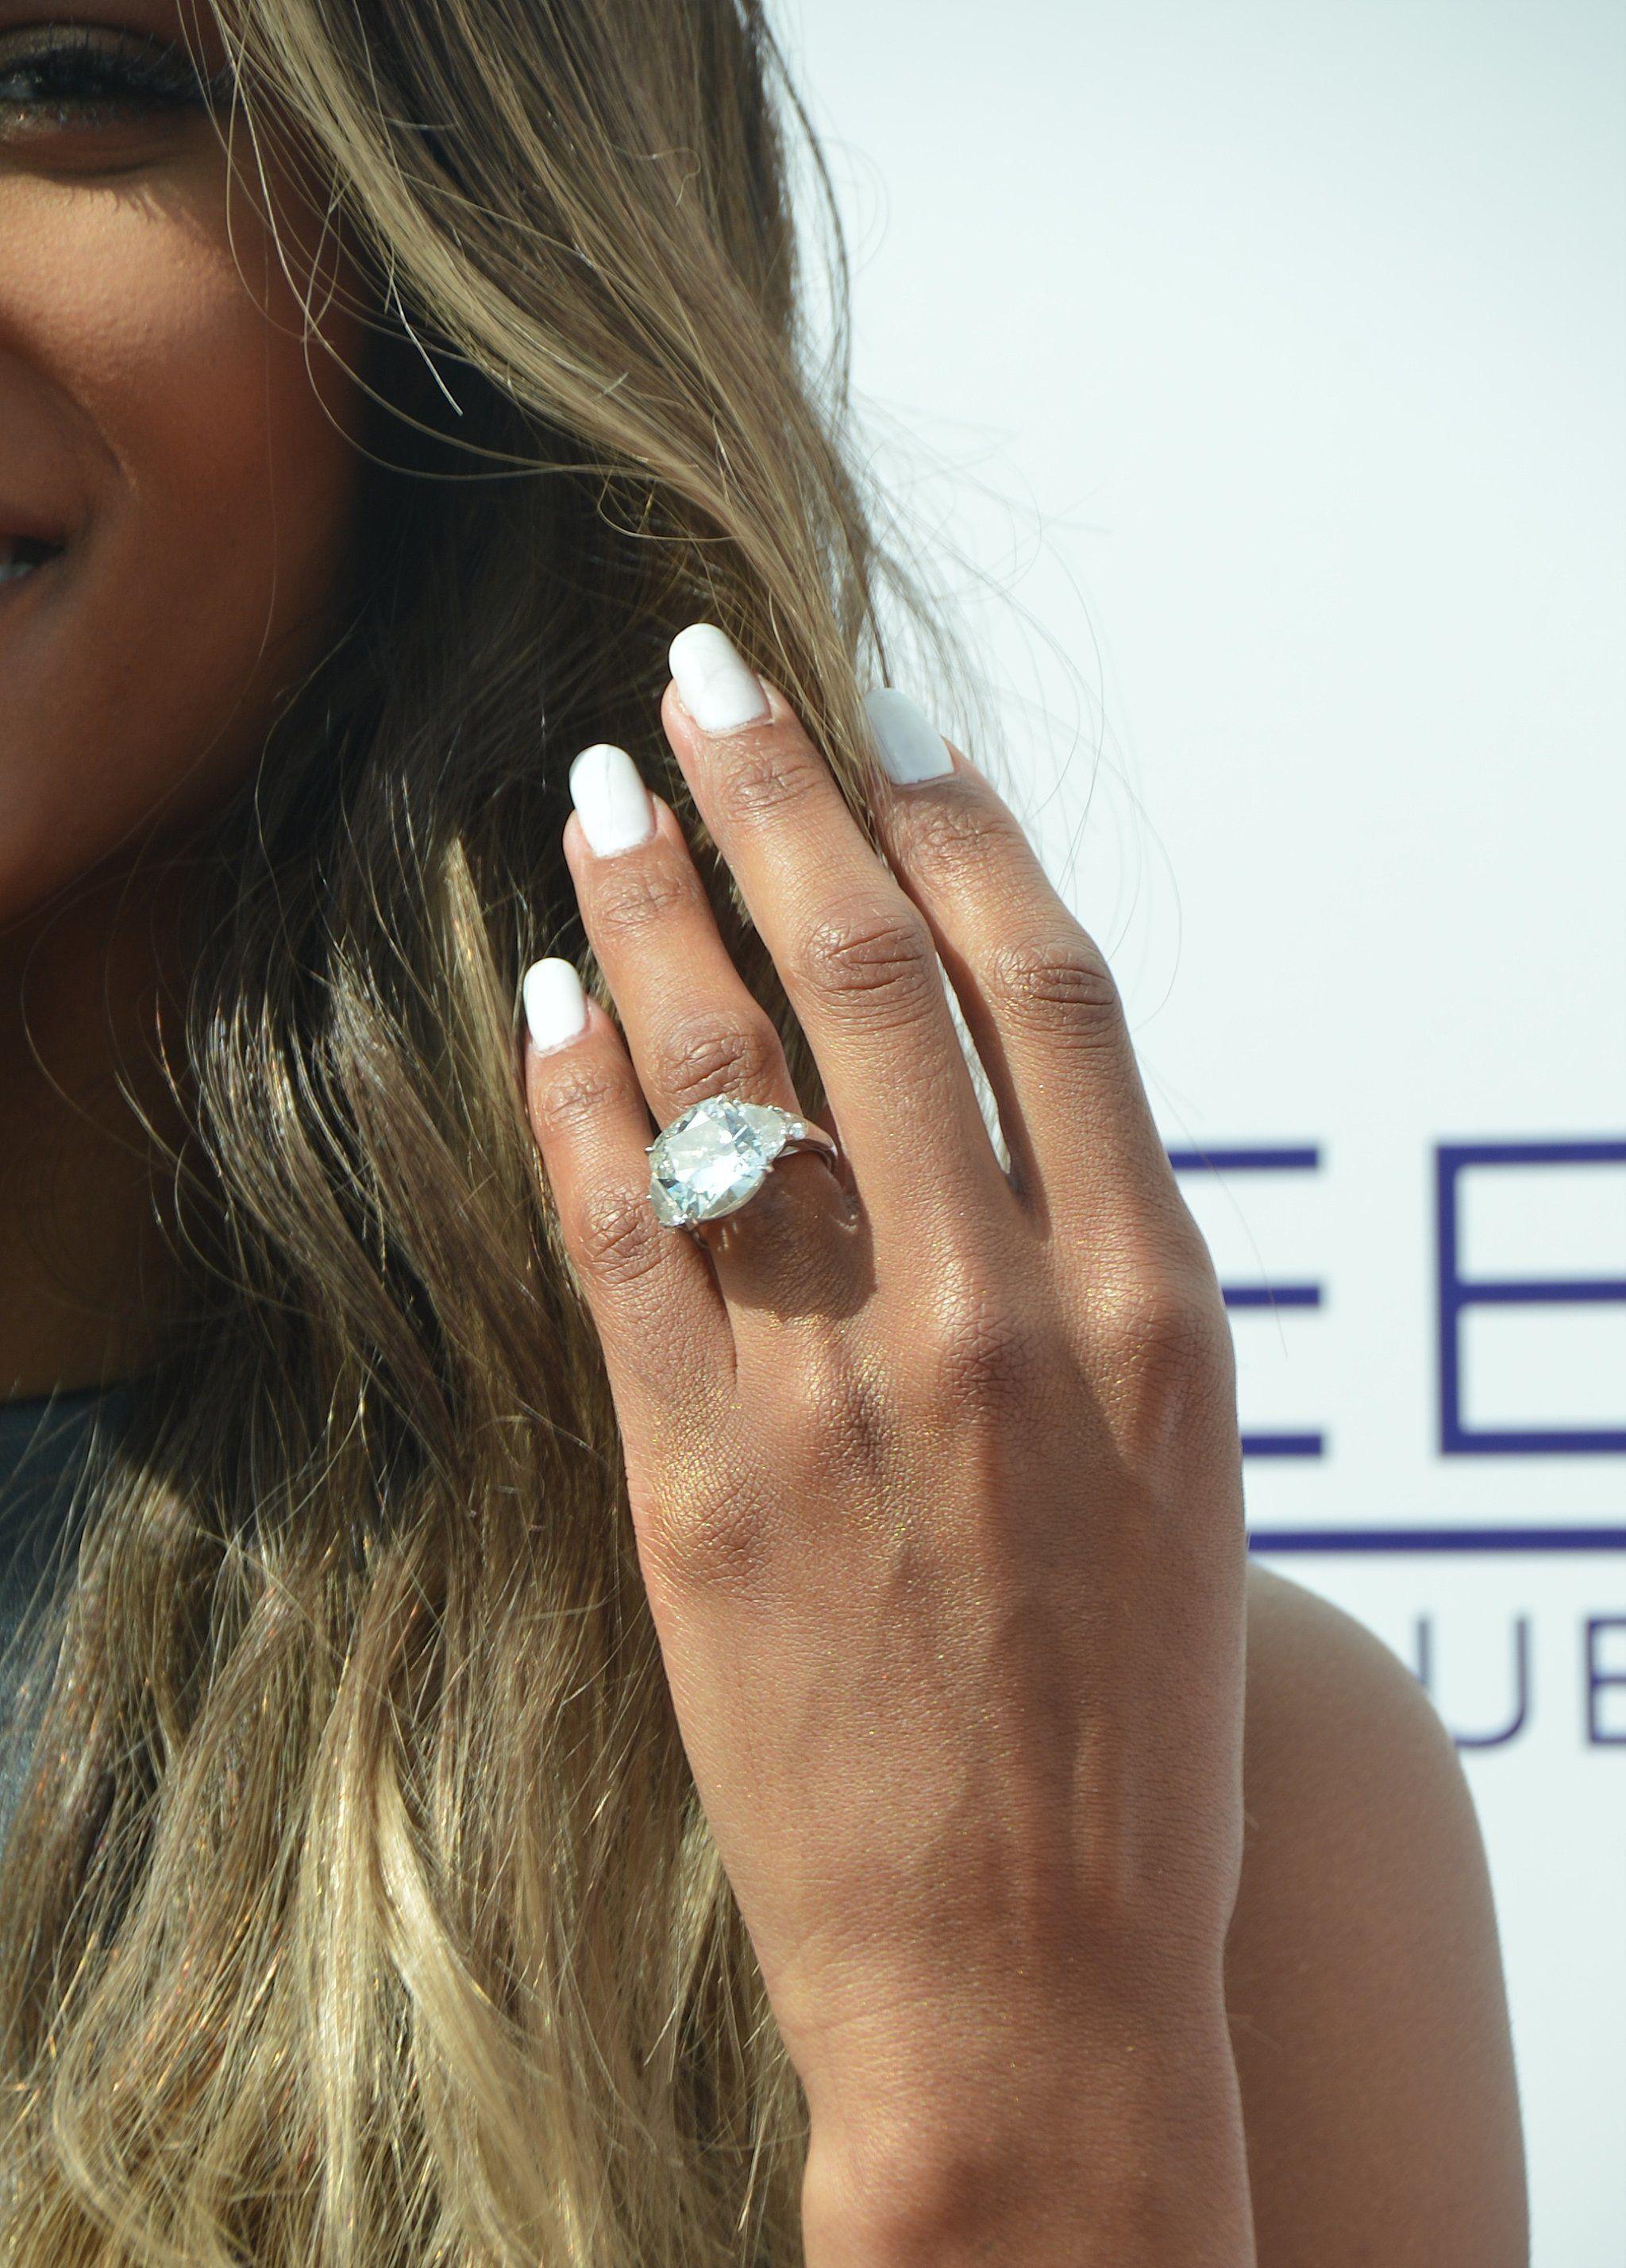 Get An Up Close Look At Ciara S Massive 16 Carat Engagement Ring Ciara Engagement Ring Celebrity Engagement Rings Best Engagement Rings